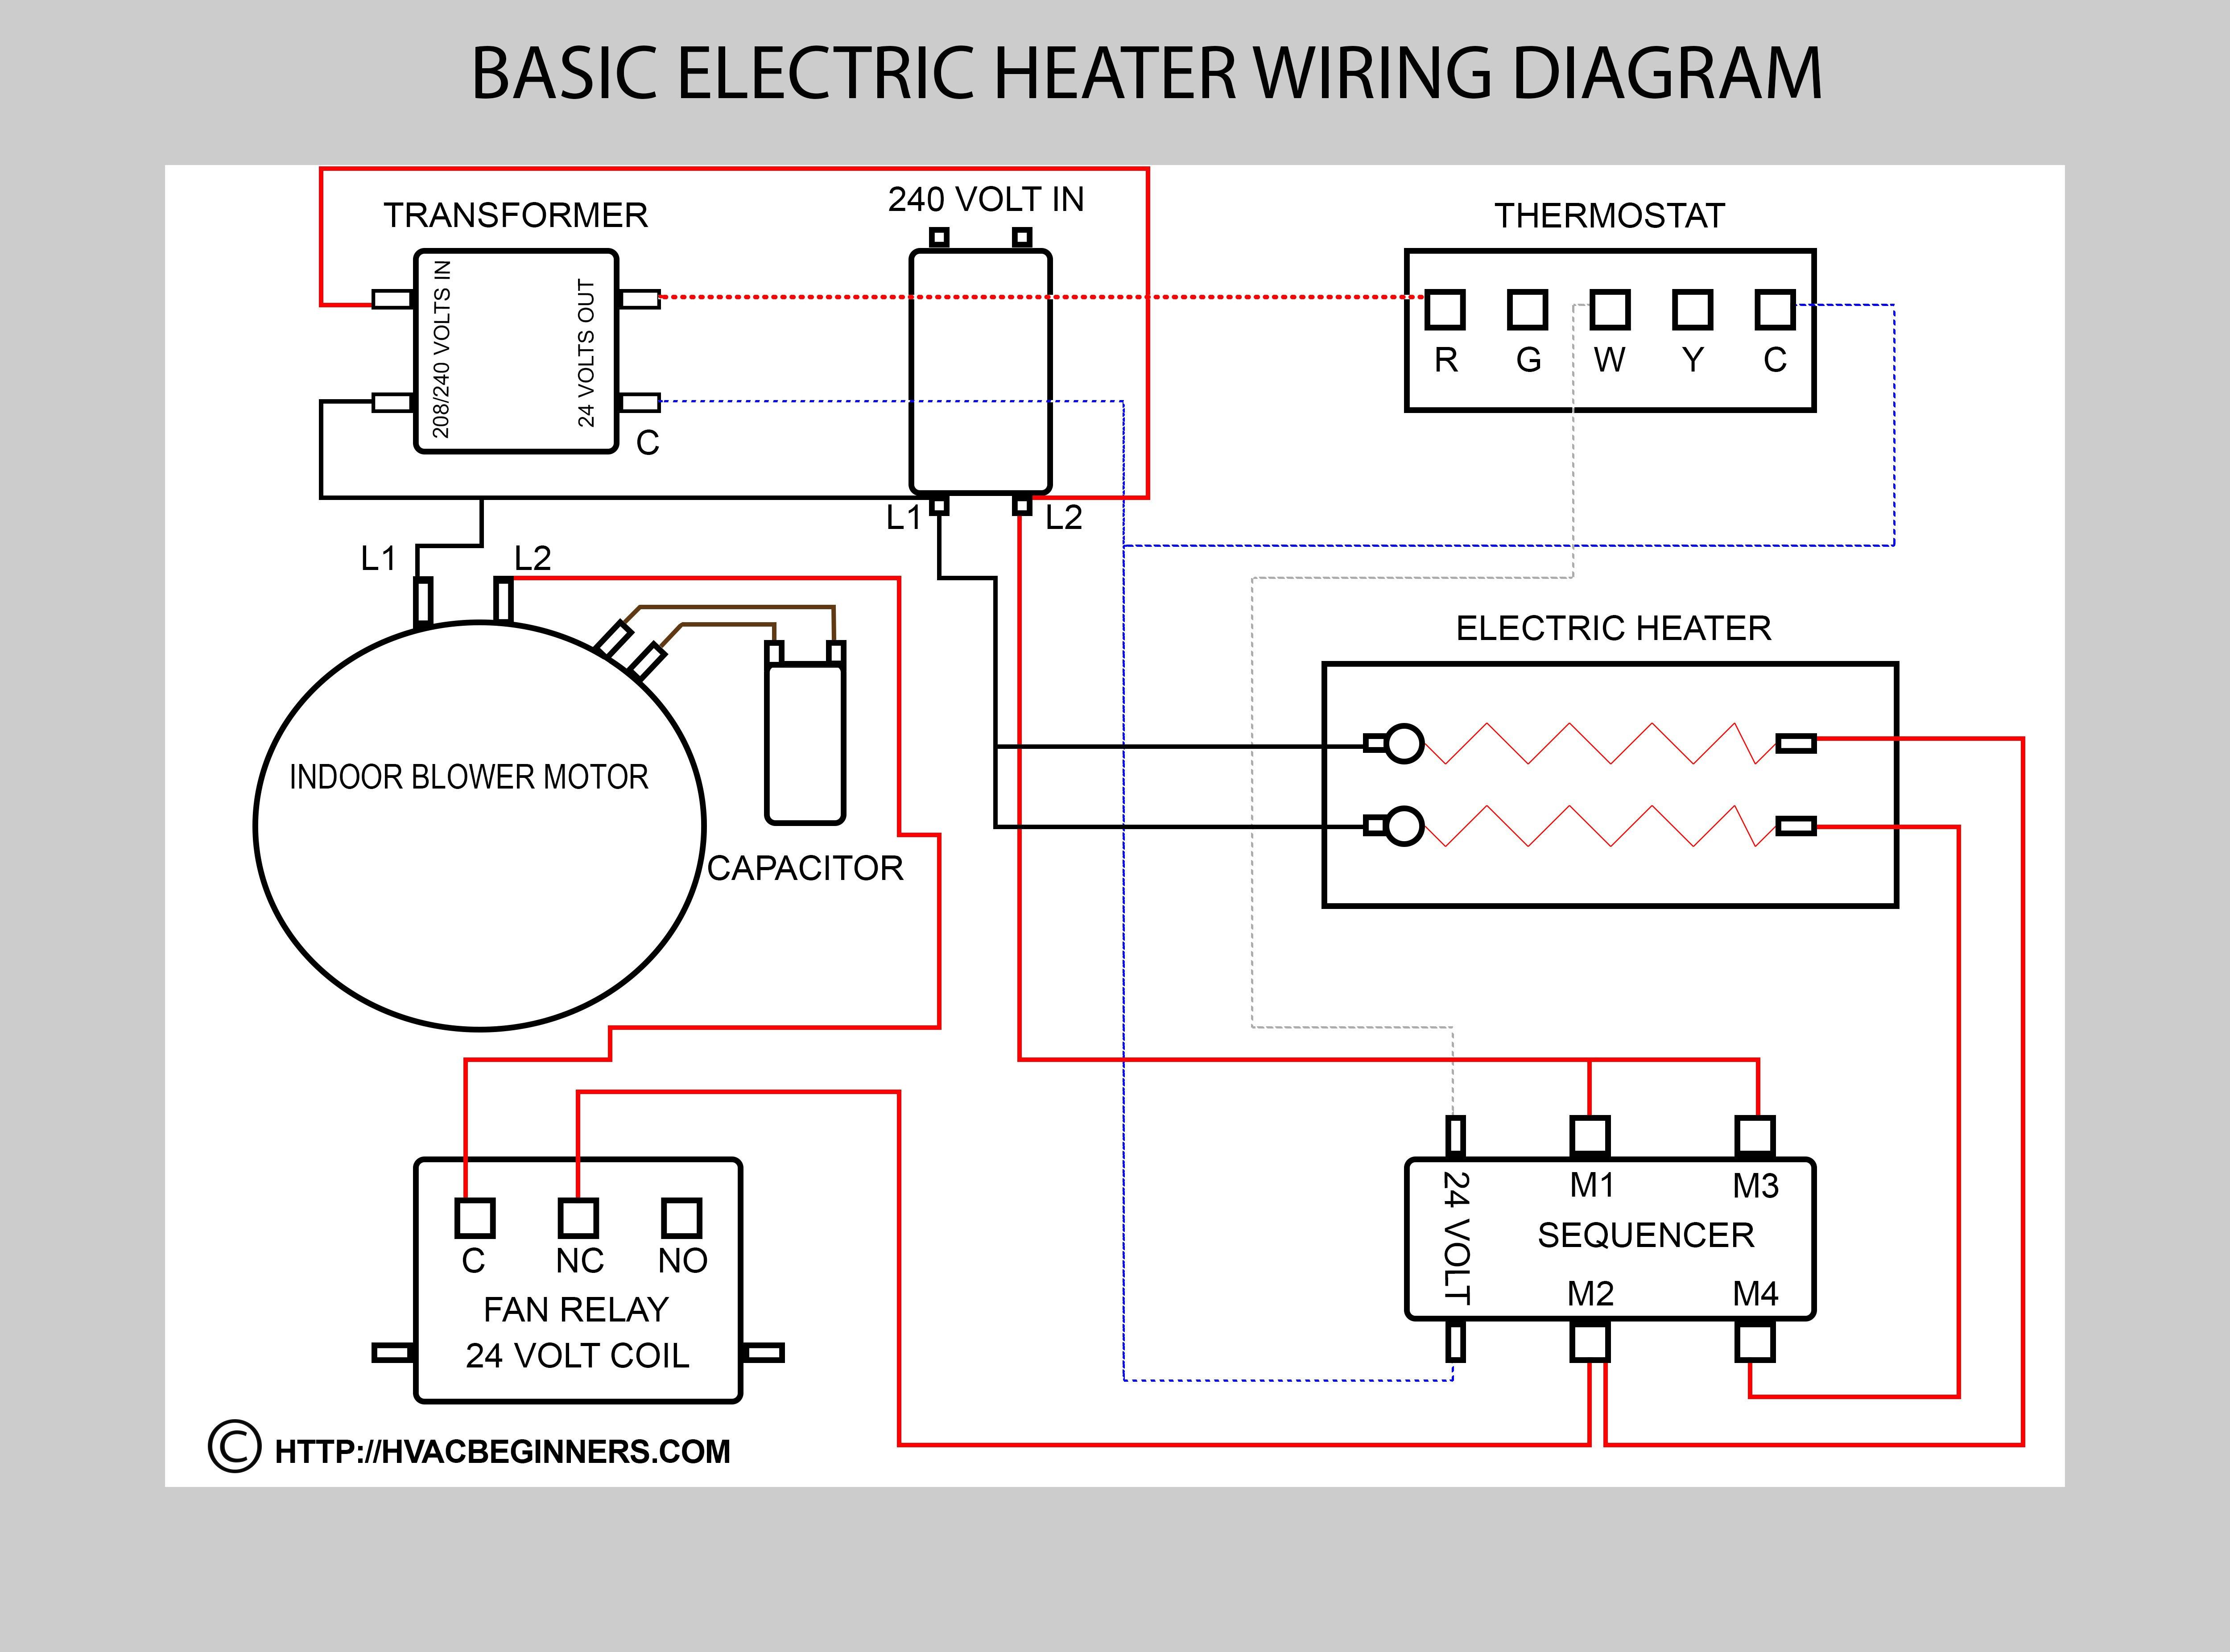 X13 Wiring Diagram | Wiring Diagram - Electric Heater Wiring Diagram